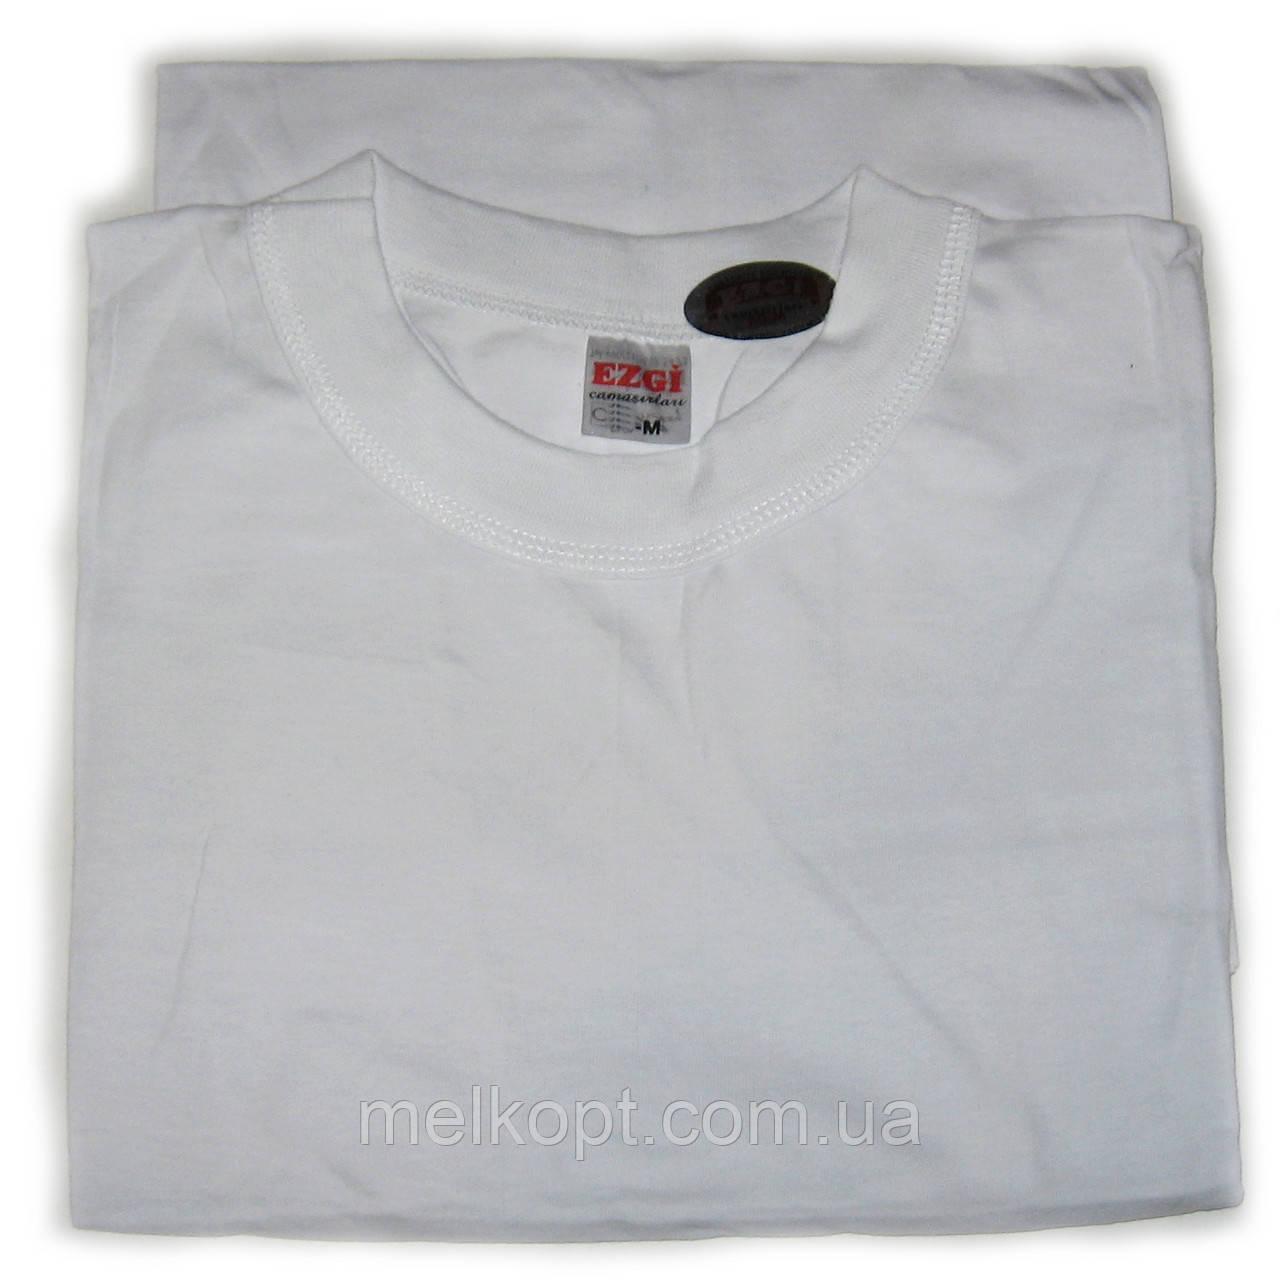 Мужские футболки Ezgi - 67,00 грн./шт. (70-й размер, белые)